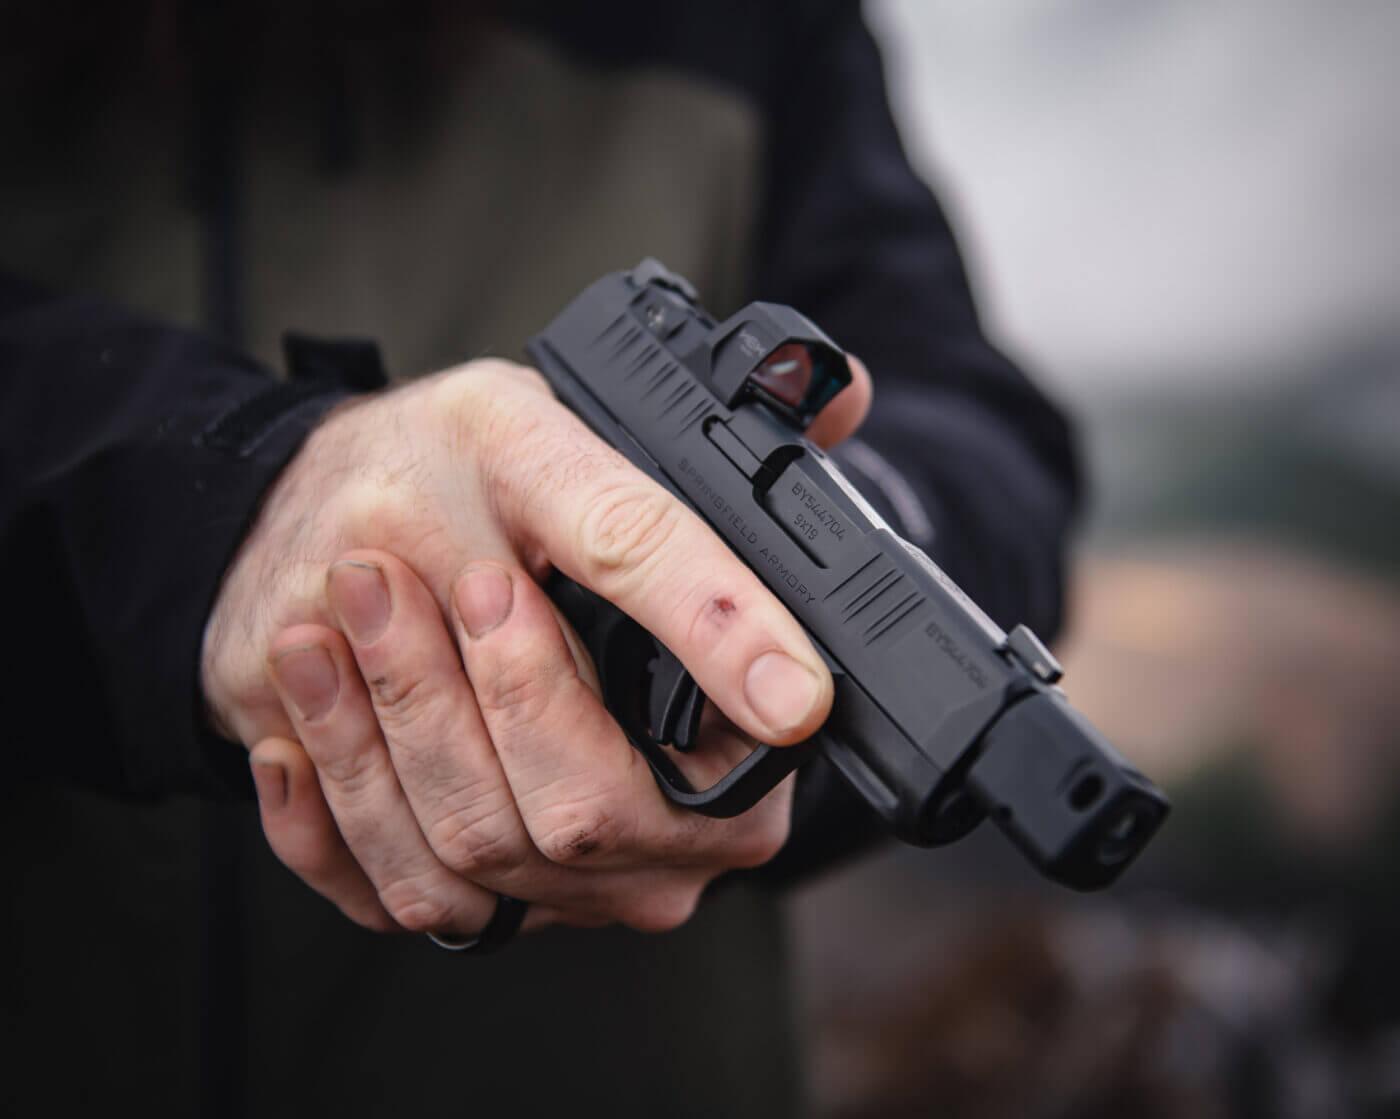 HEX Wasp on pistol